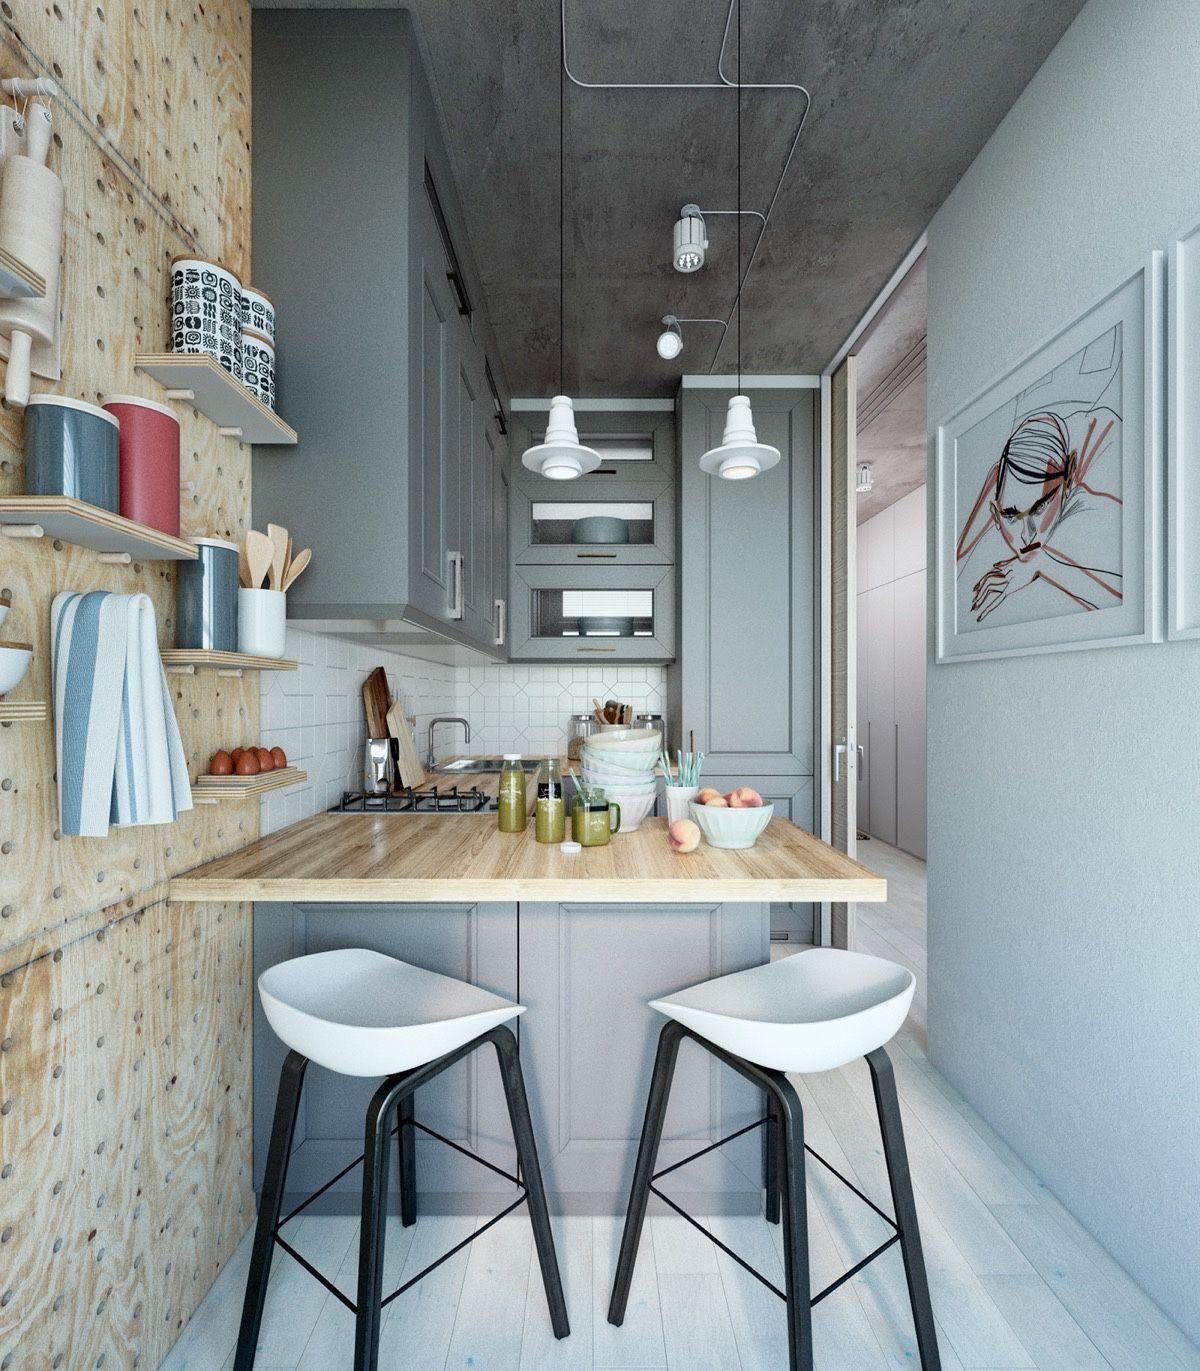 Minimalist Design Is The Best Design For Kitchen You Can Apply Scandinav Small Kitchen Design Apartment Interior Design Kitchen Apartment Kitchen Ideas Design